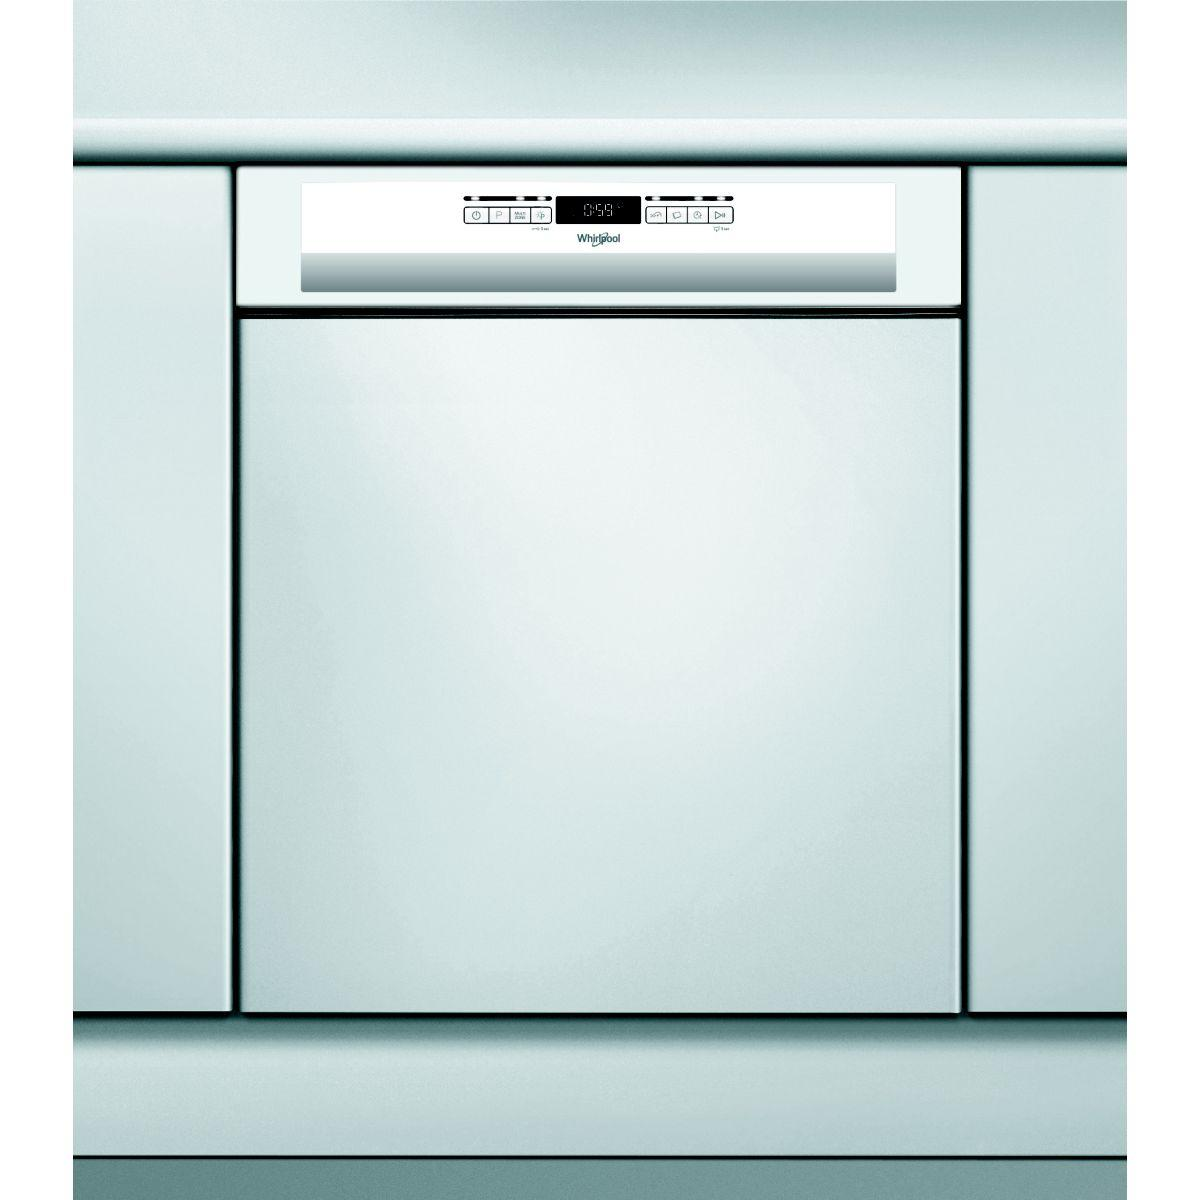 Lave vaisselle encastrable whirlpool wkbo3t123pf - livraison o...